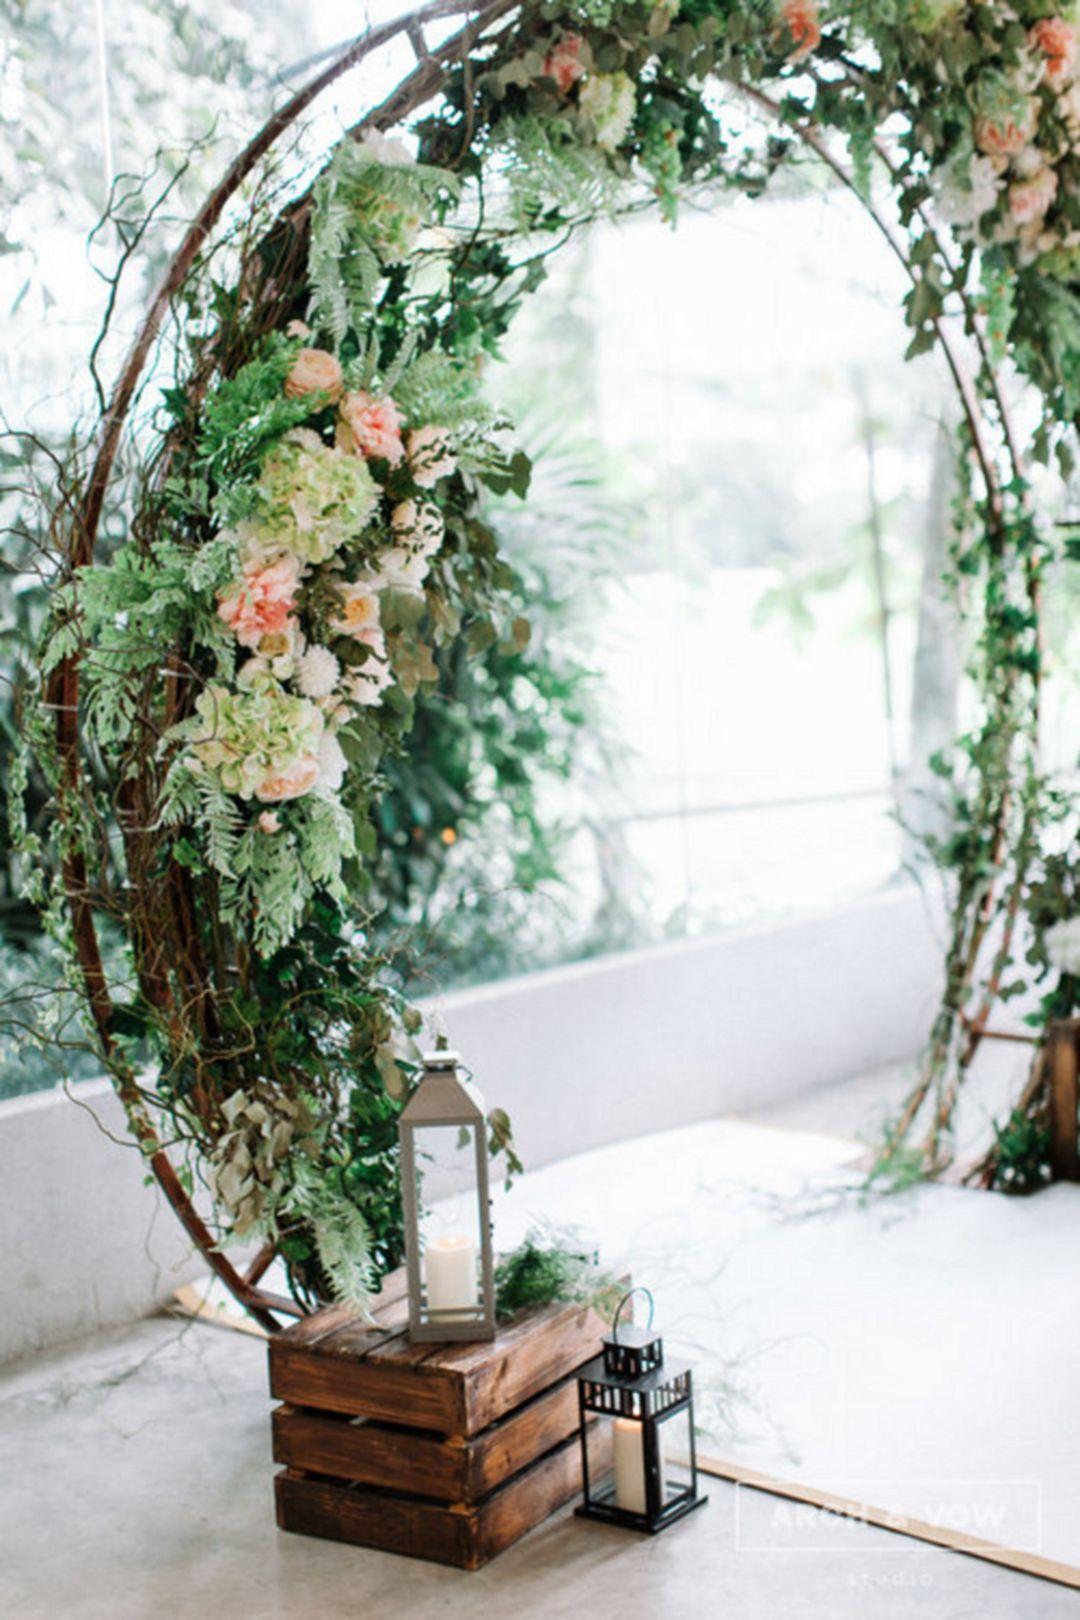 111+ Unforgettable Rustic Wedding Decor Ideas For Unique Wedding ...